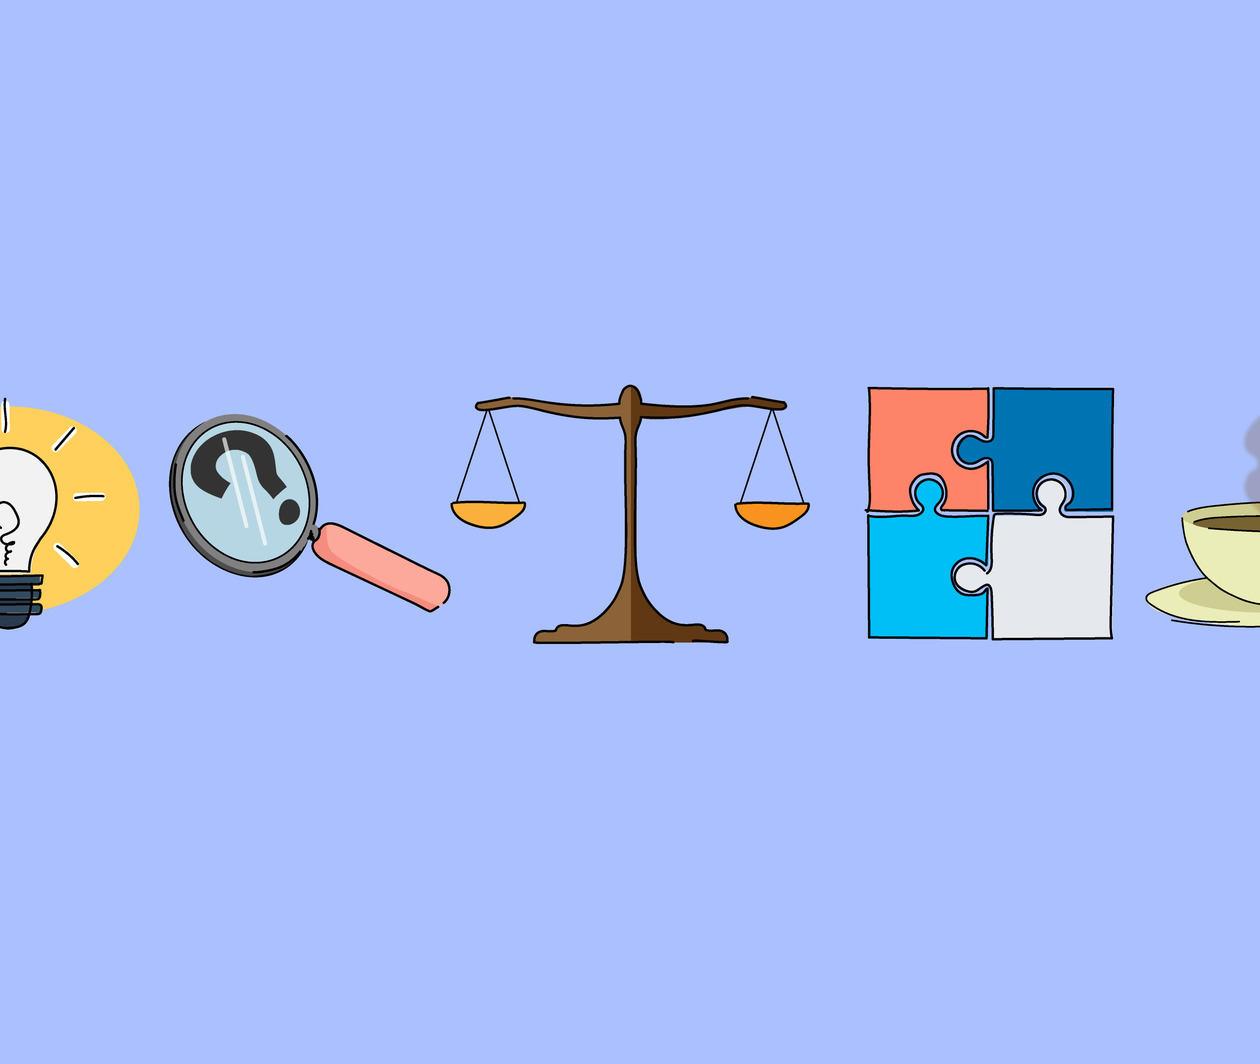 Making Judgements and Ensuring Quality – May '21